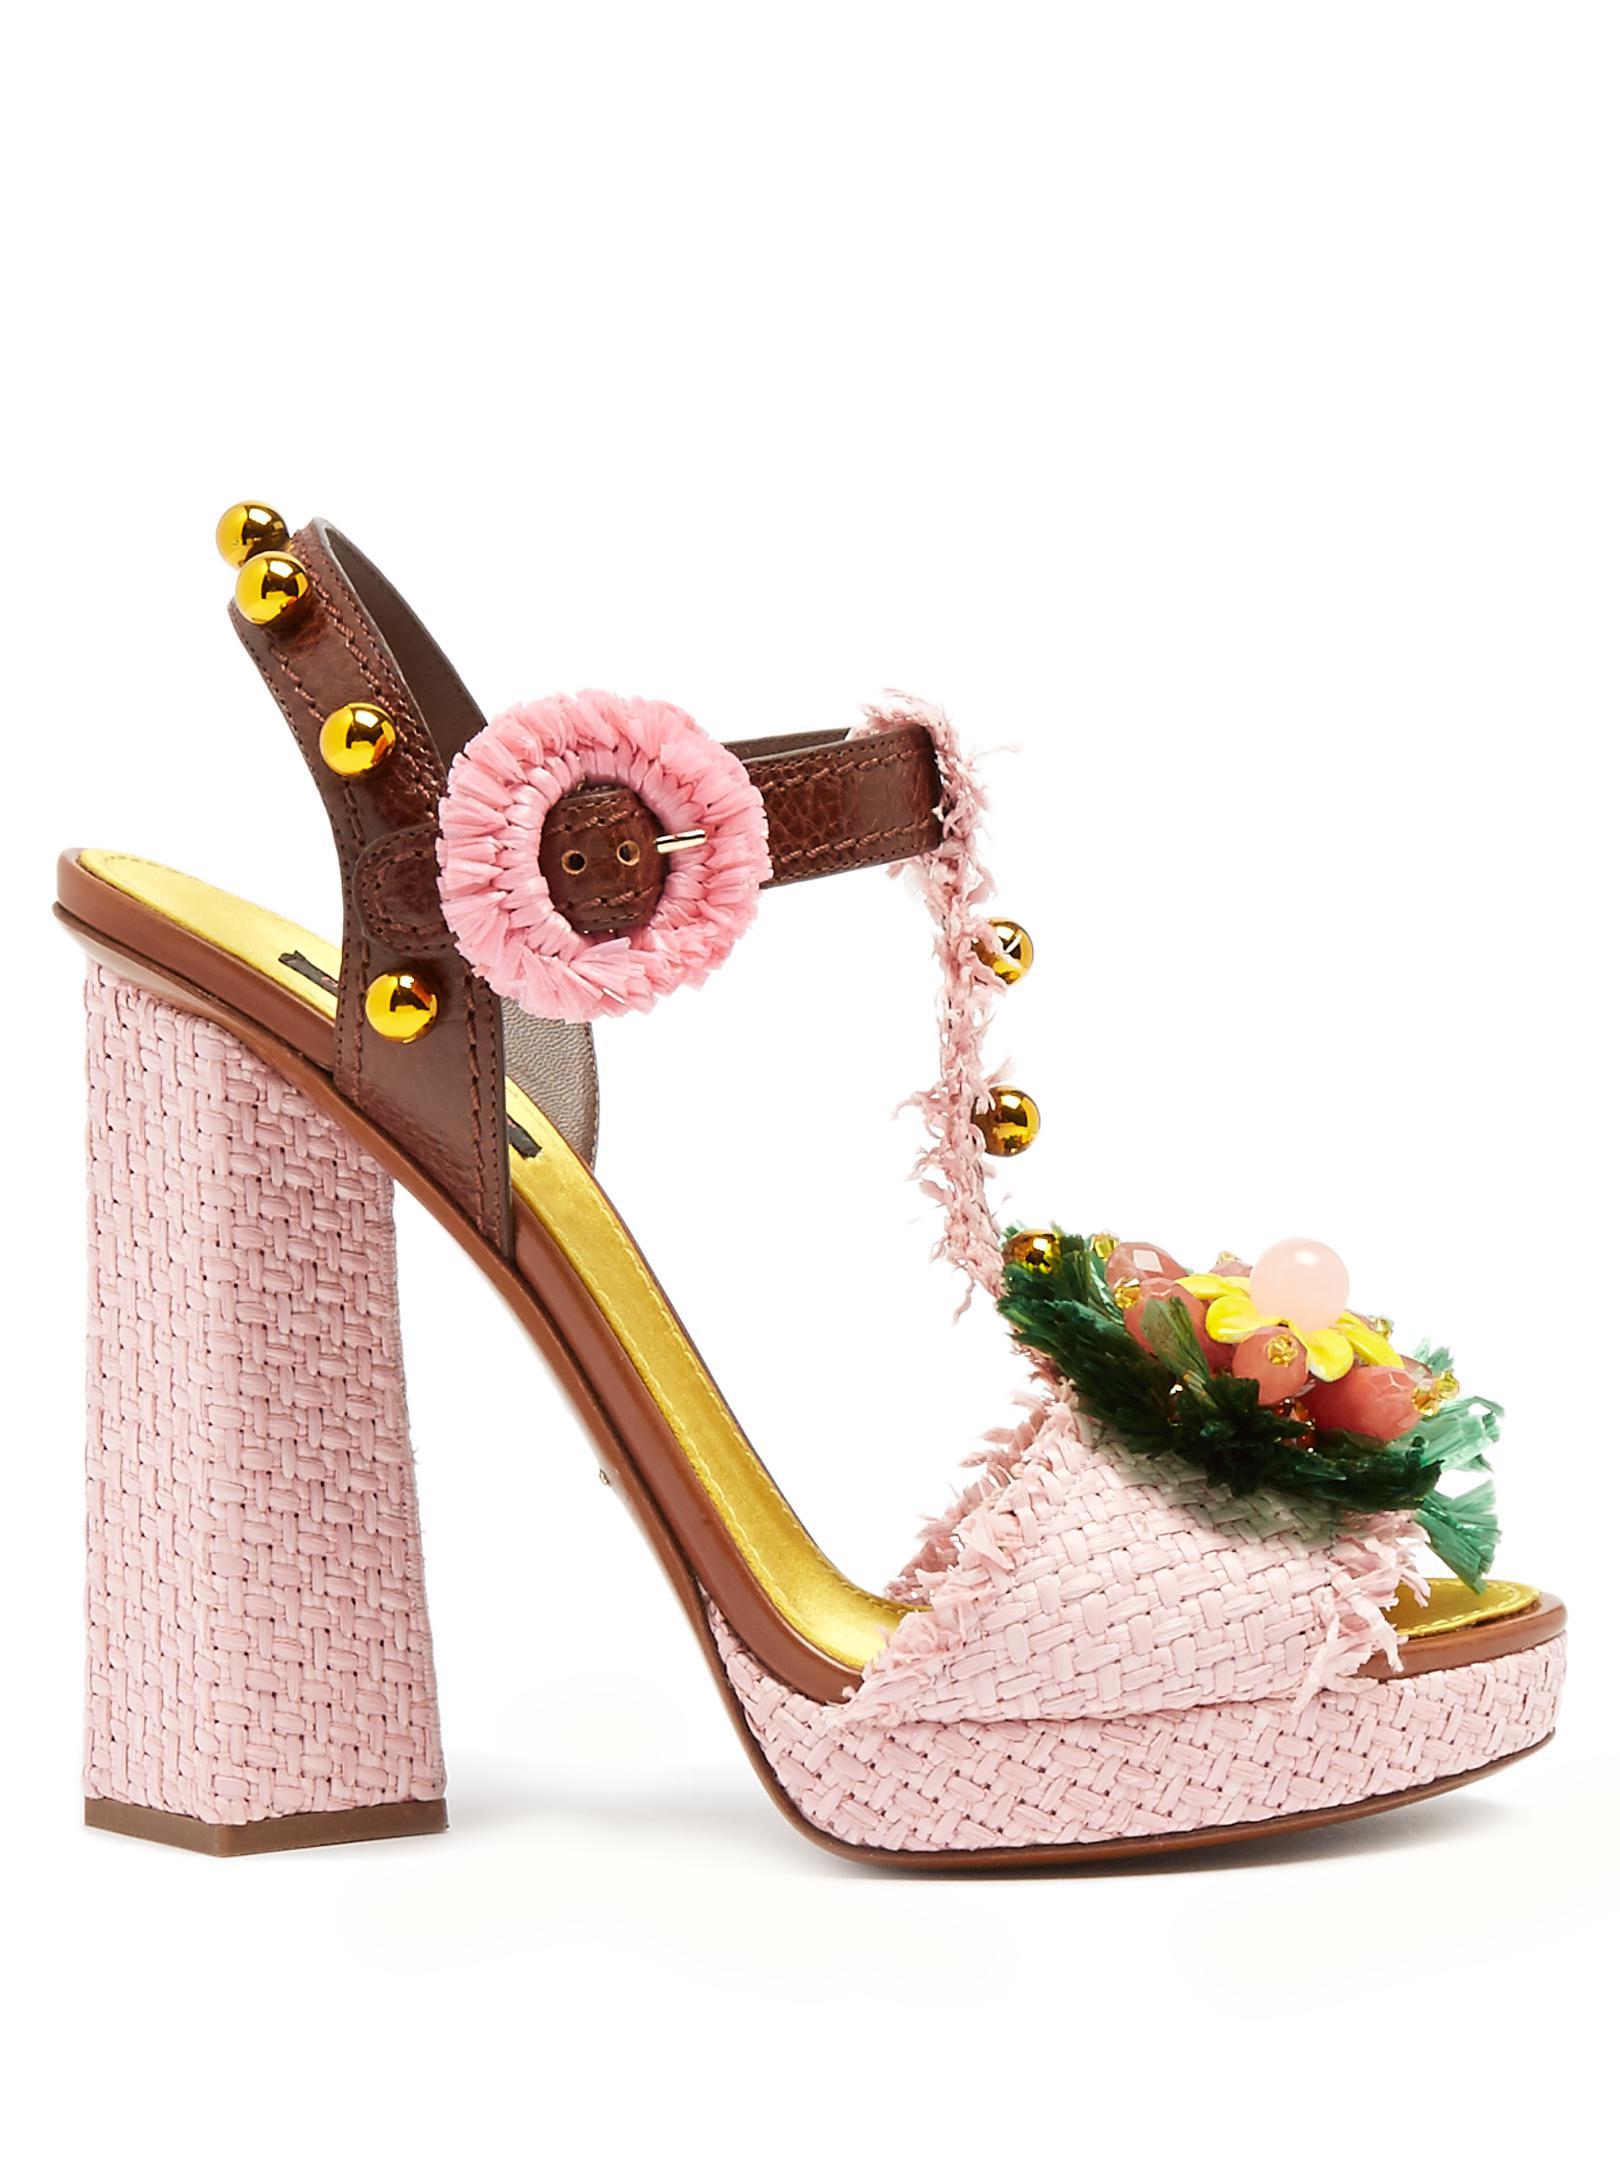 Dolce & Gabbana Woman Crystal-embellished Raffia Sandals Pink Size 40 Dolce & Gabbana IKBtyDOM4q